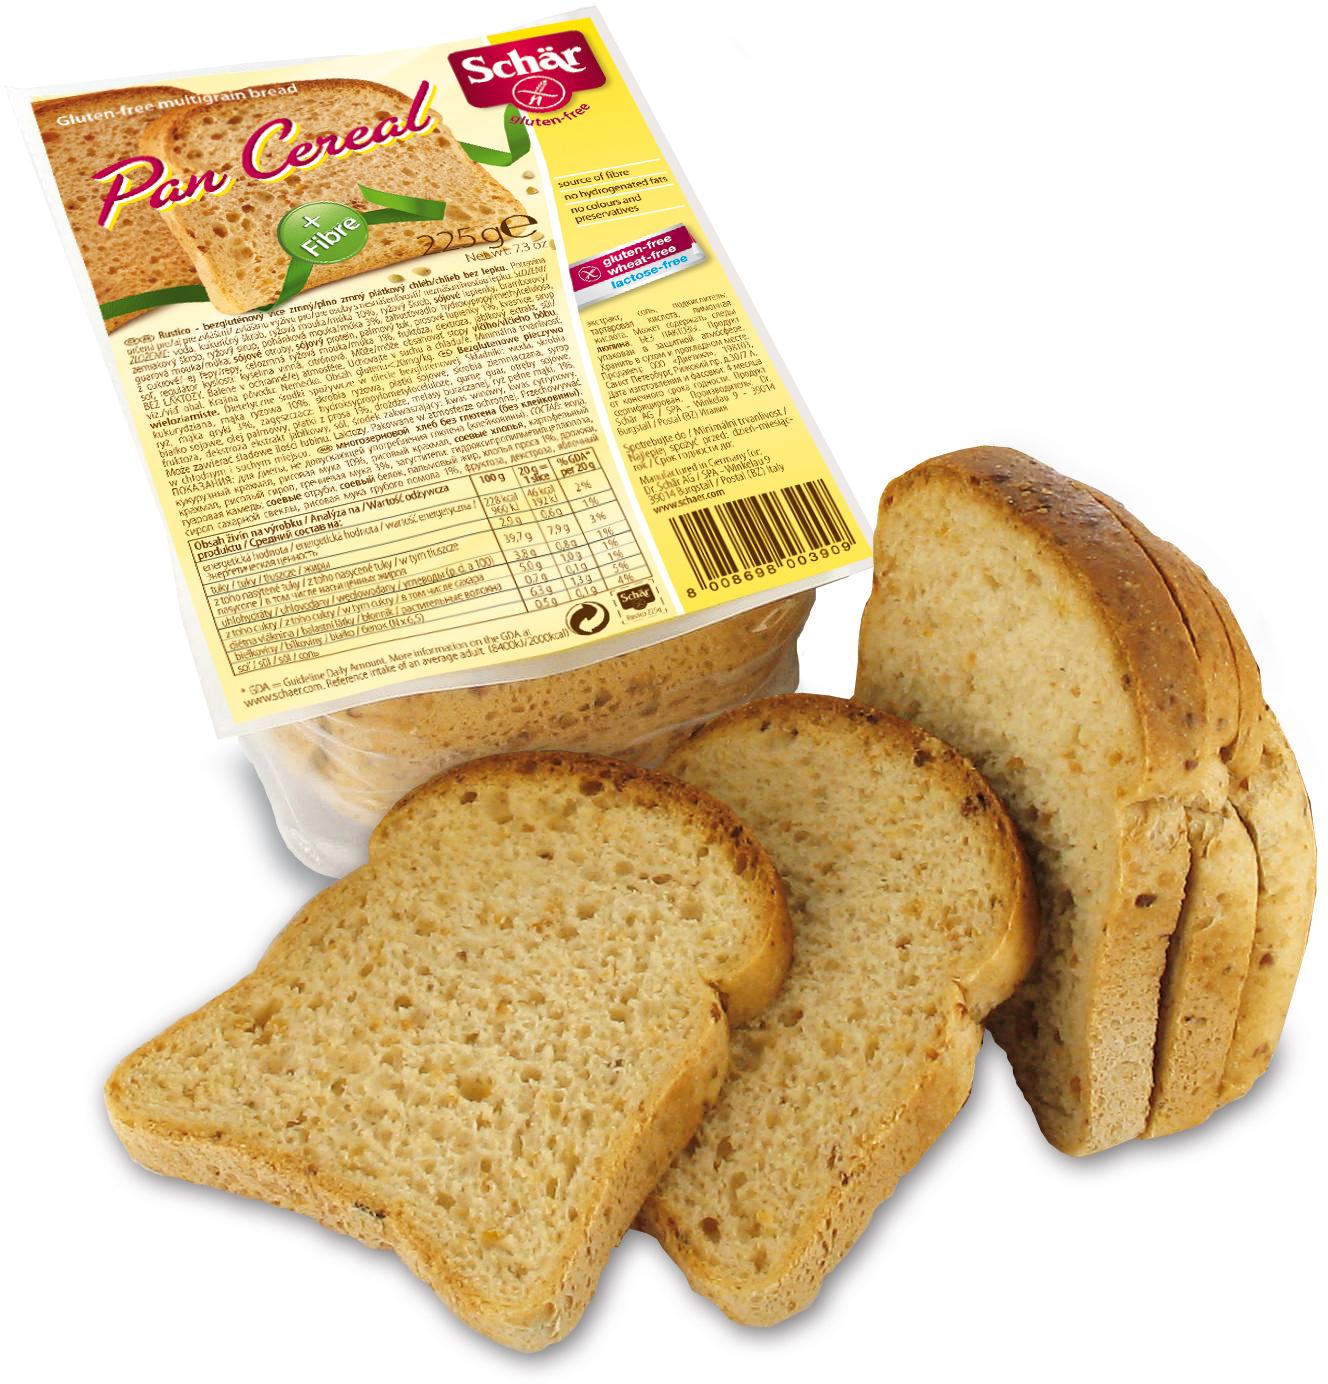 Dr. Schar Pan Cereal Хлеб многозерновой, 250 г dr schar pan carre хлеб белый 400 г